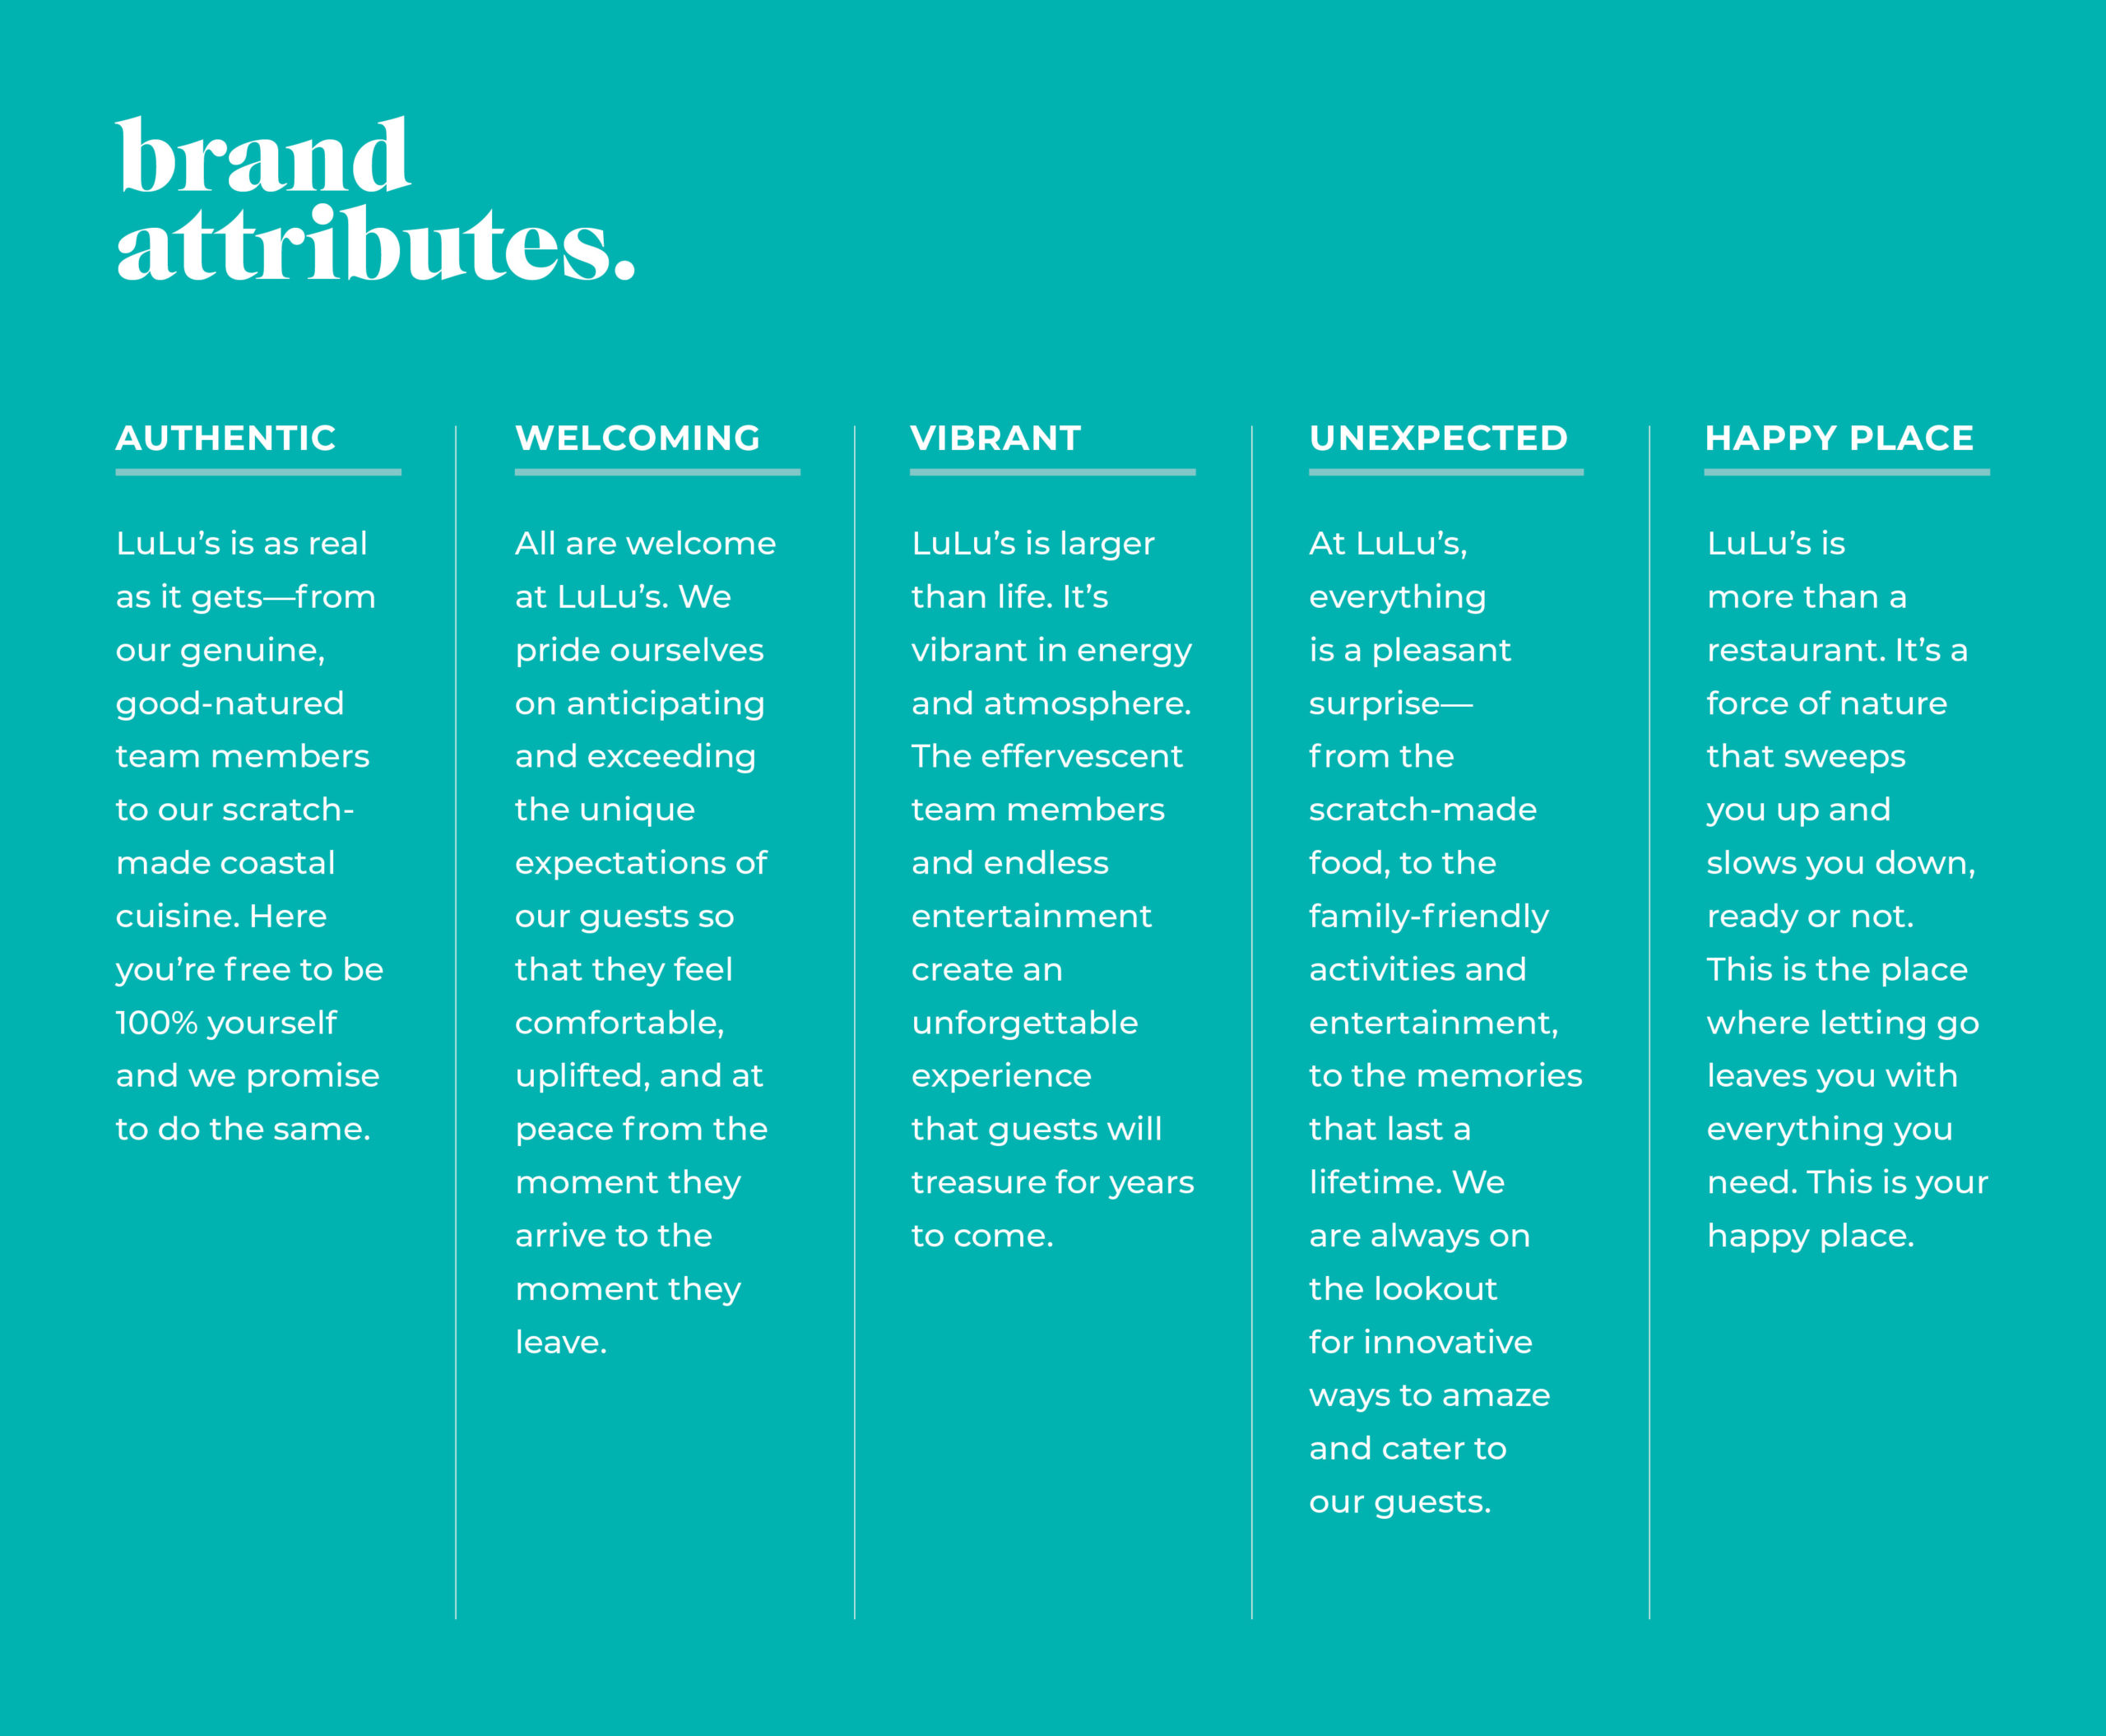 brand attributes brand positioning